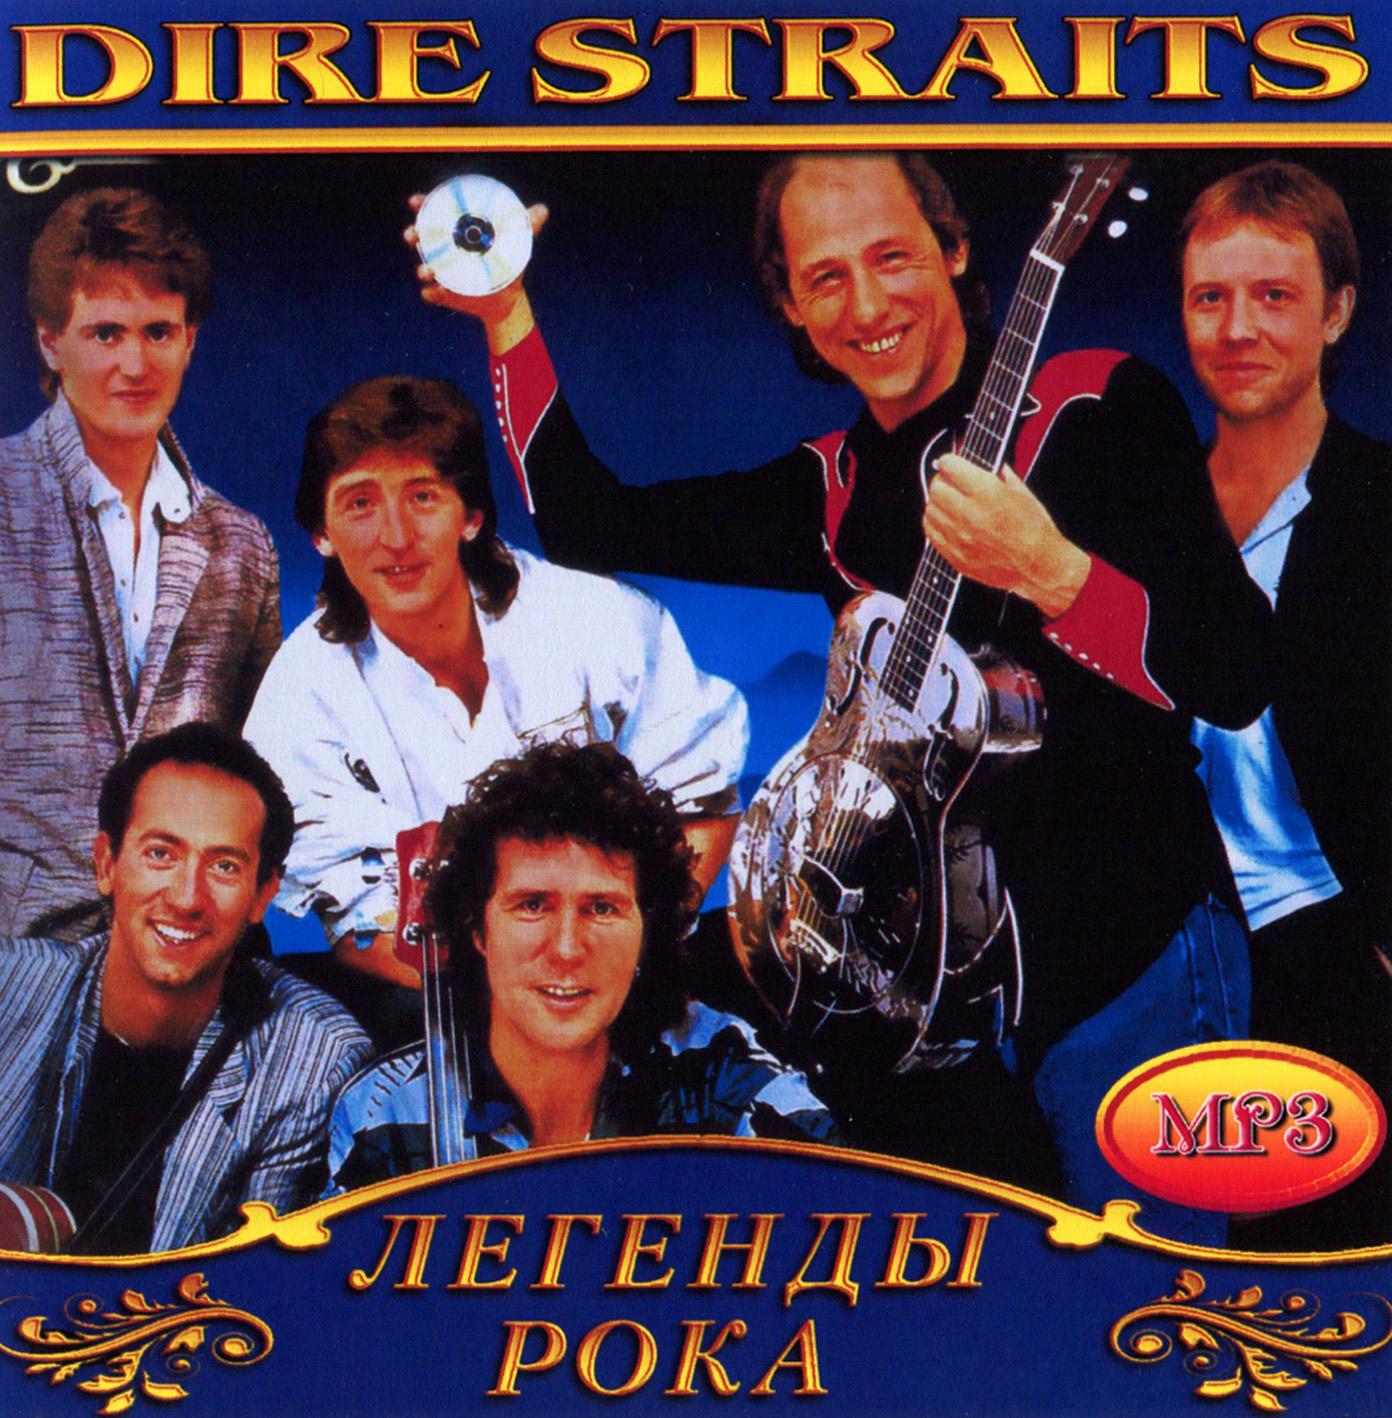 Dire Straits [mp3]